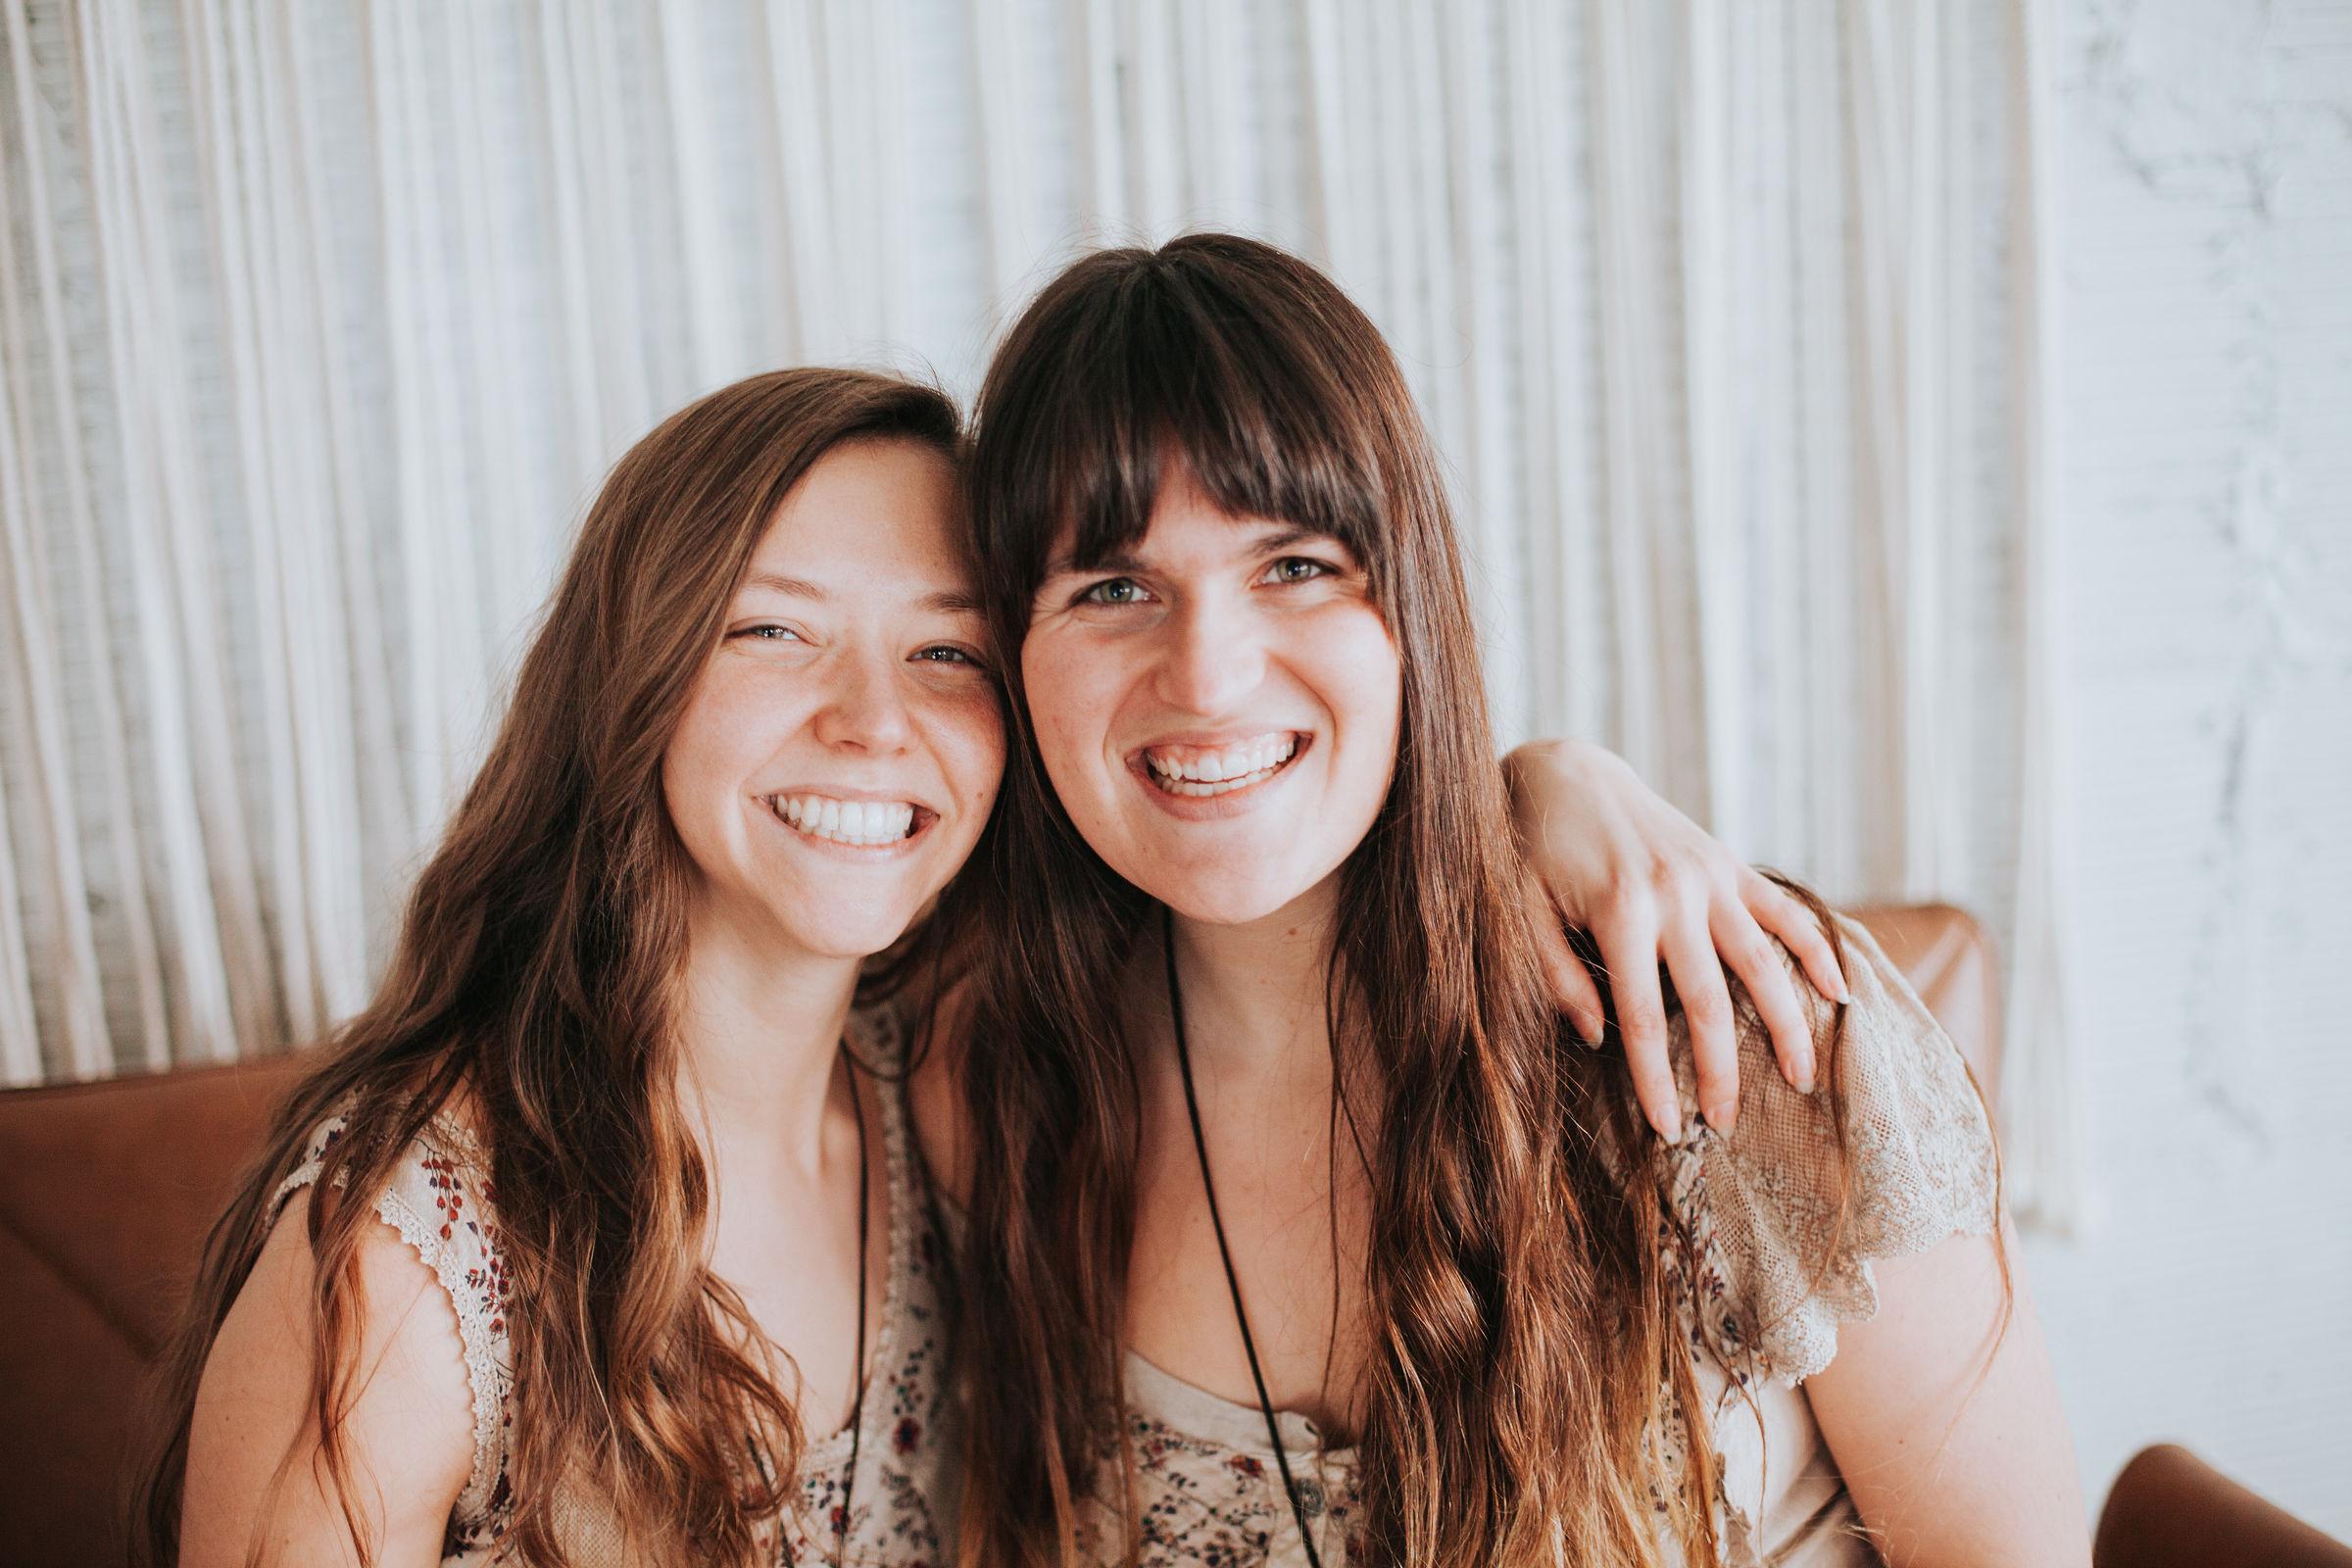 The Facilitators - Kaitlyn Bowman & Lindsay Chestnut